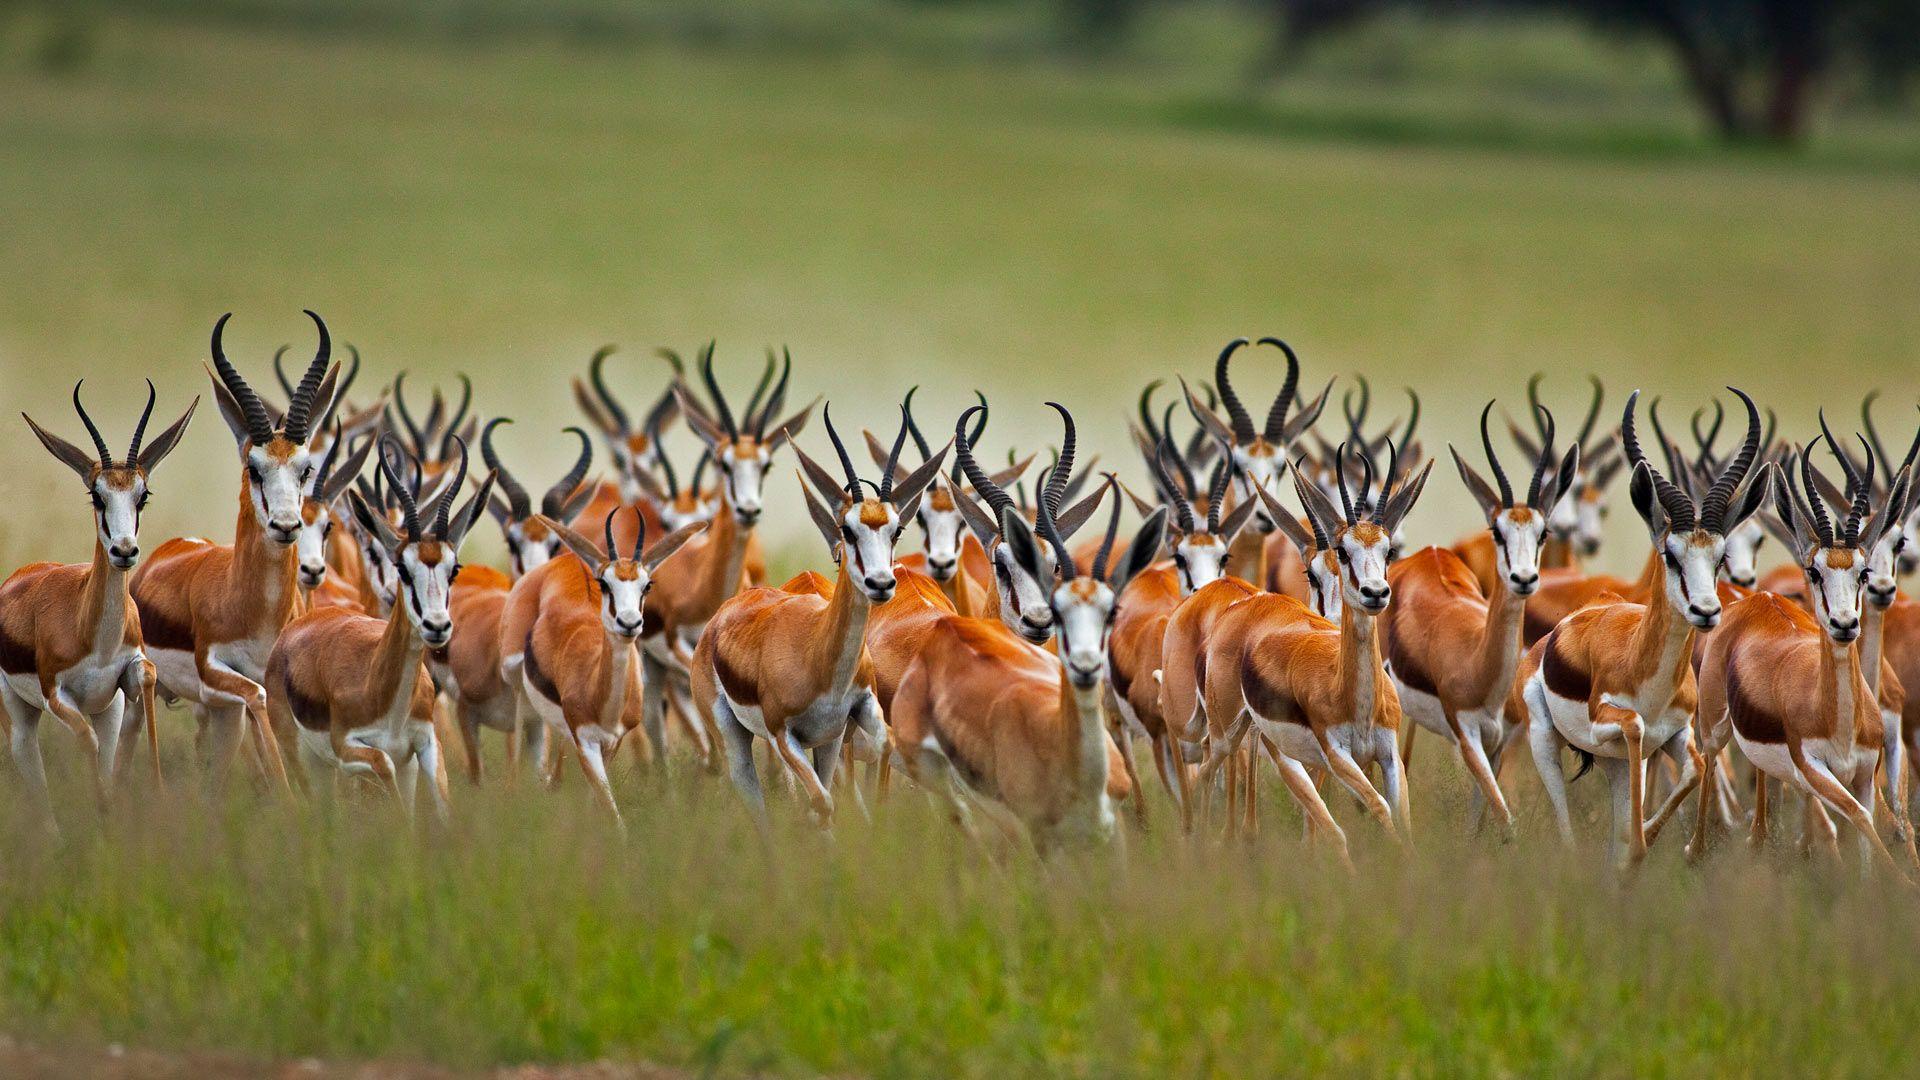 Horn Minden a herd of springboks in the kalahari region of south africa